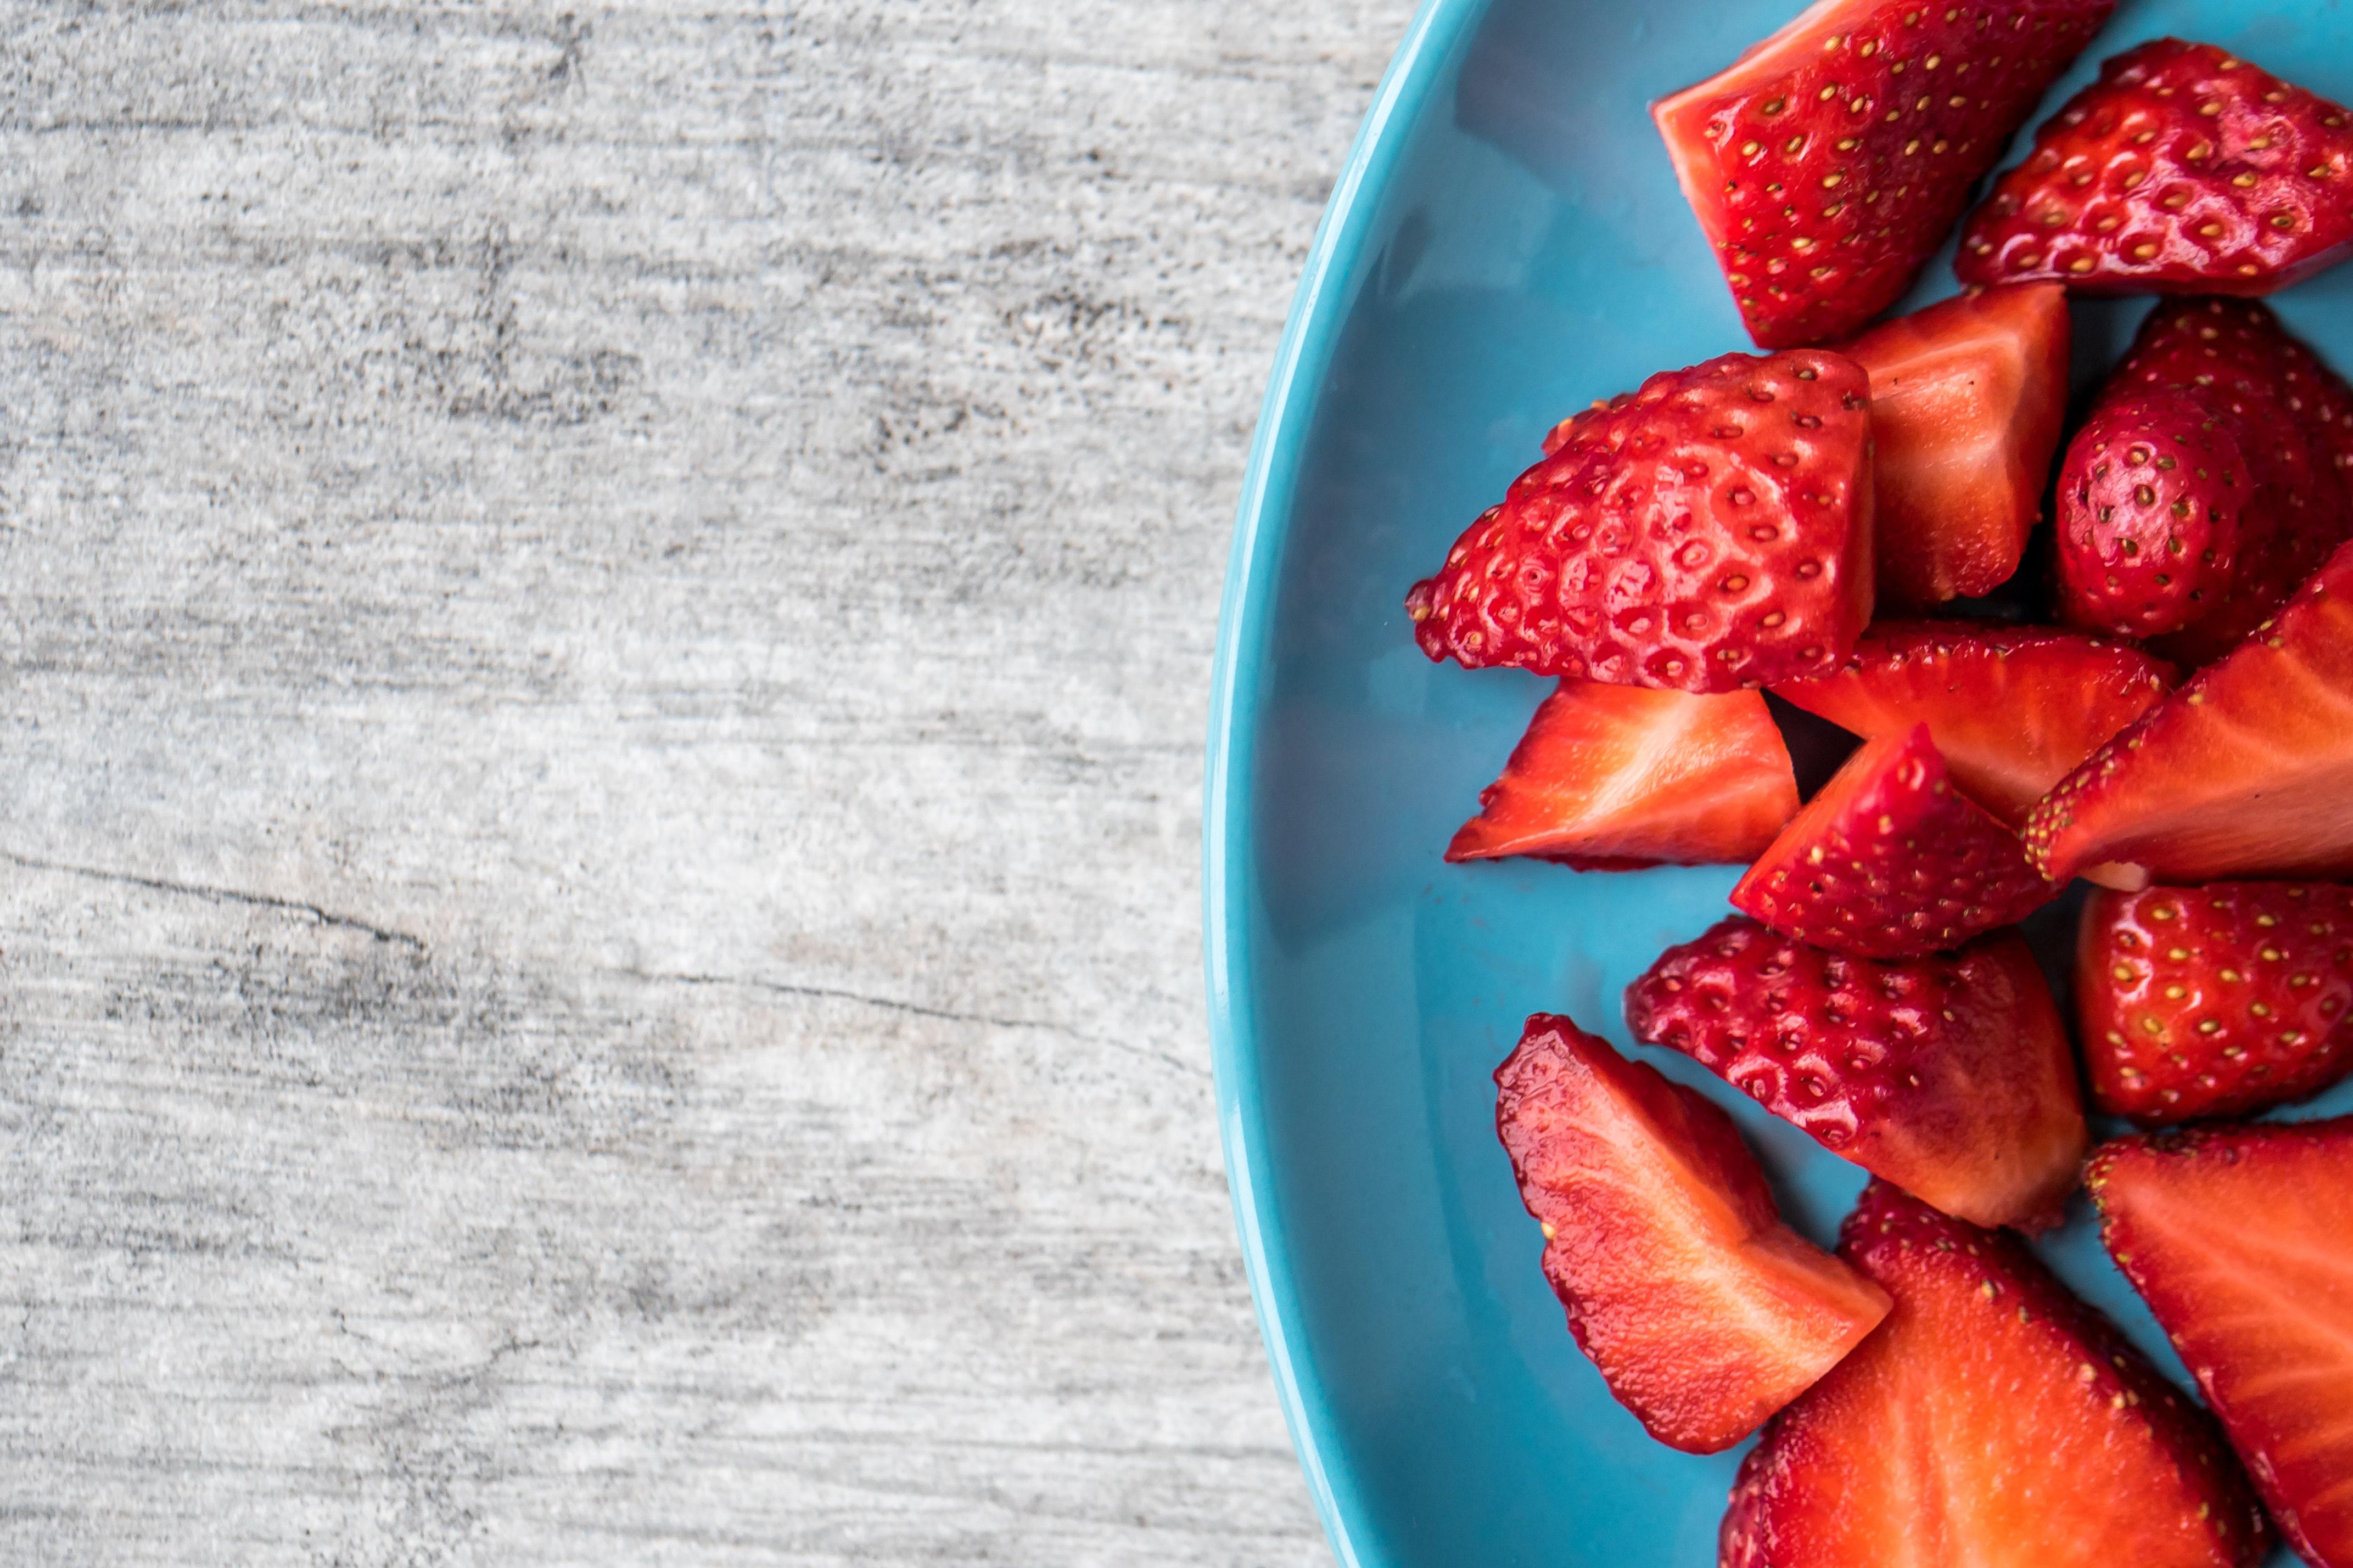 berry-close-up-color-992819